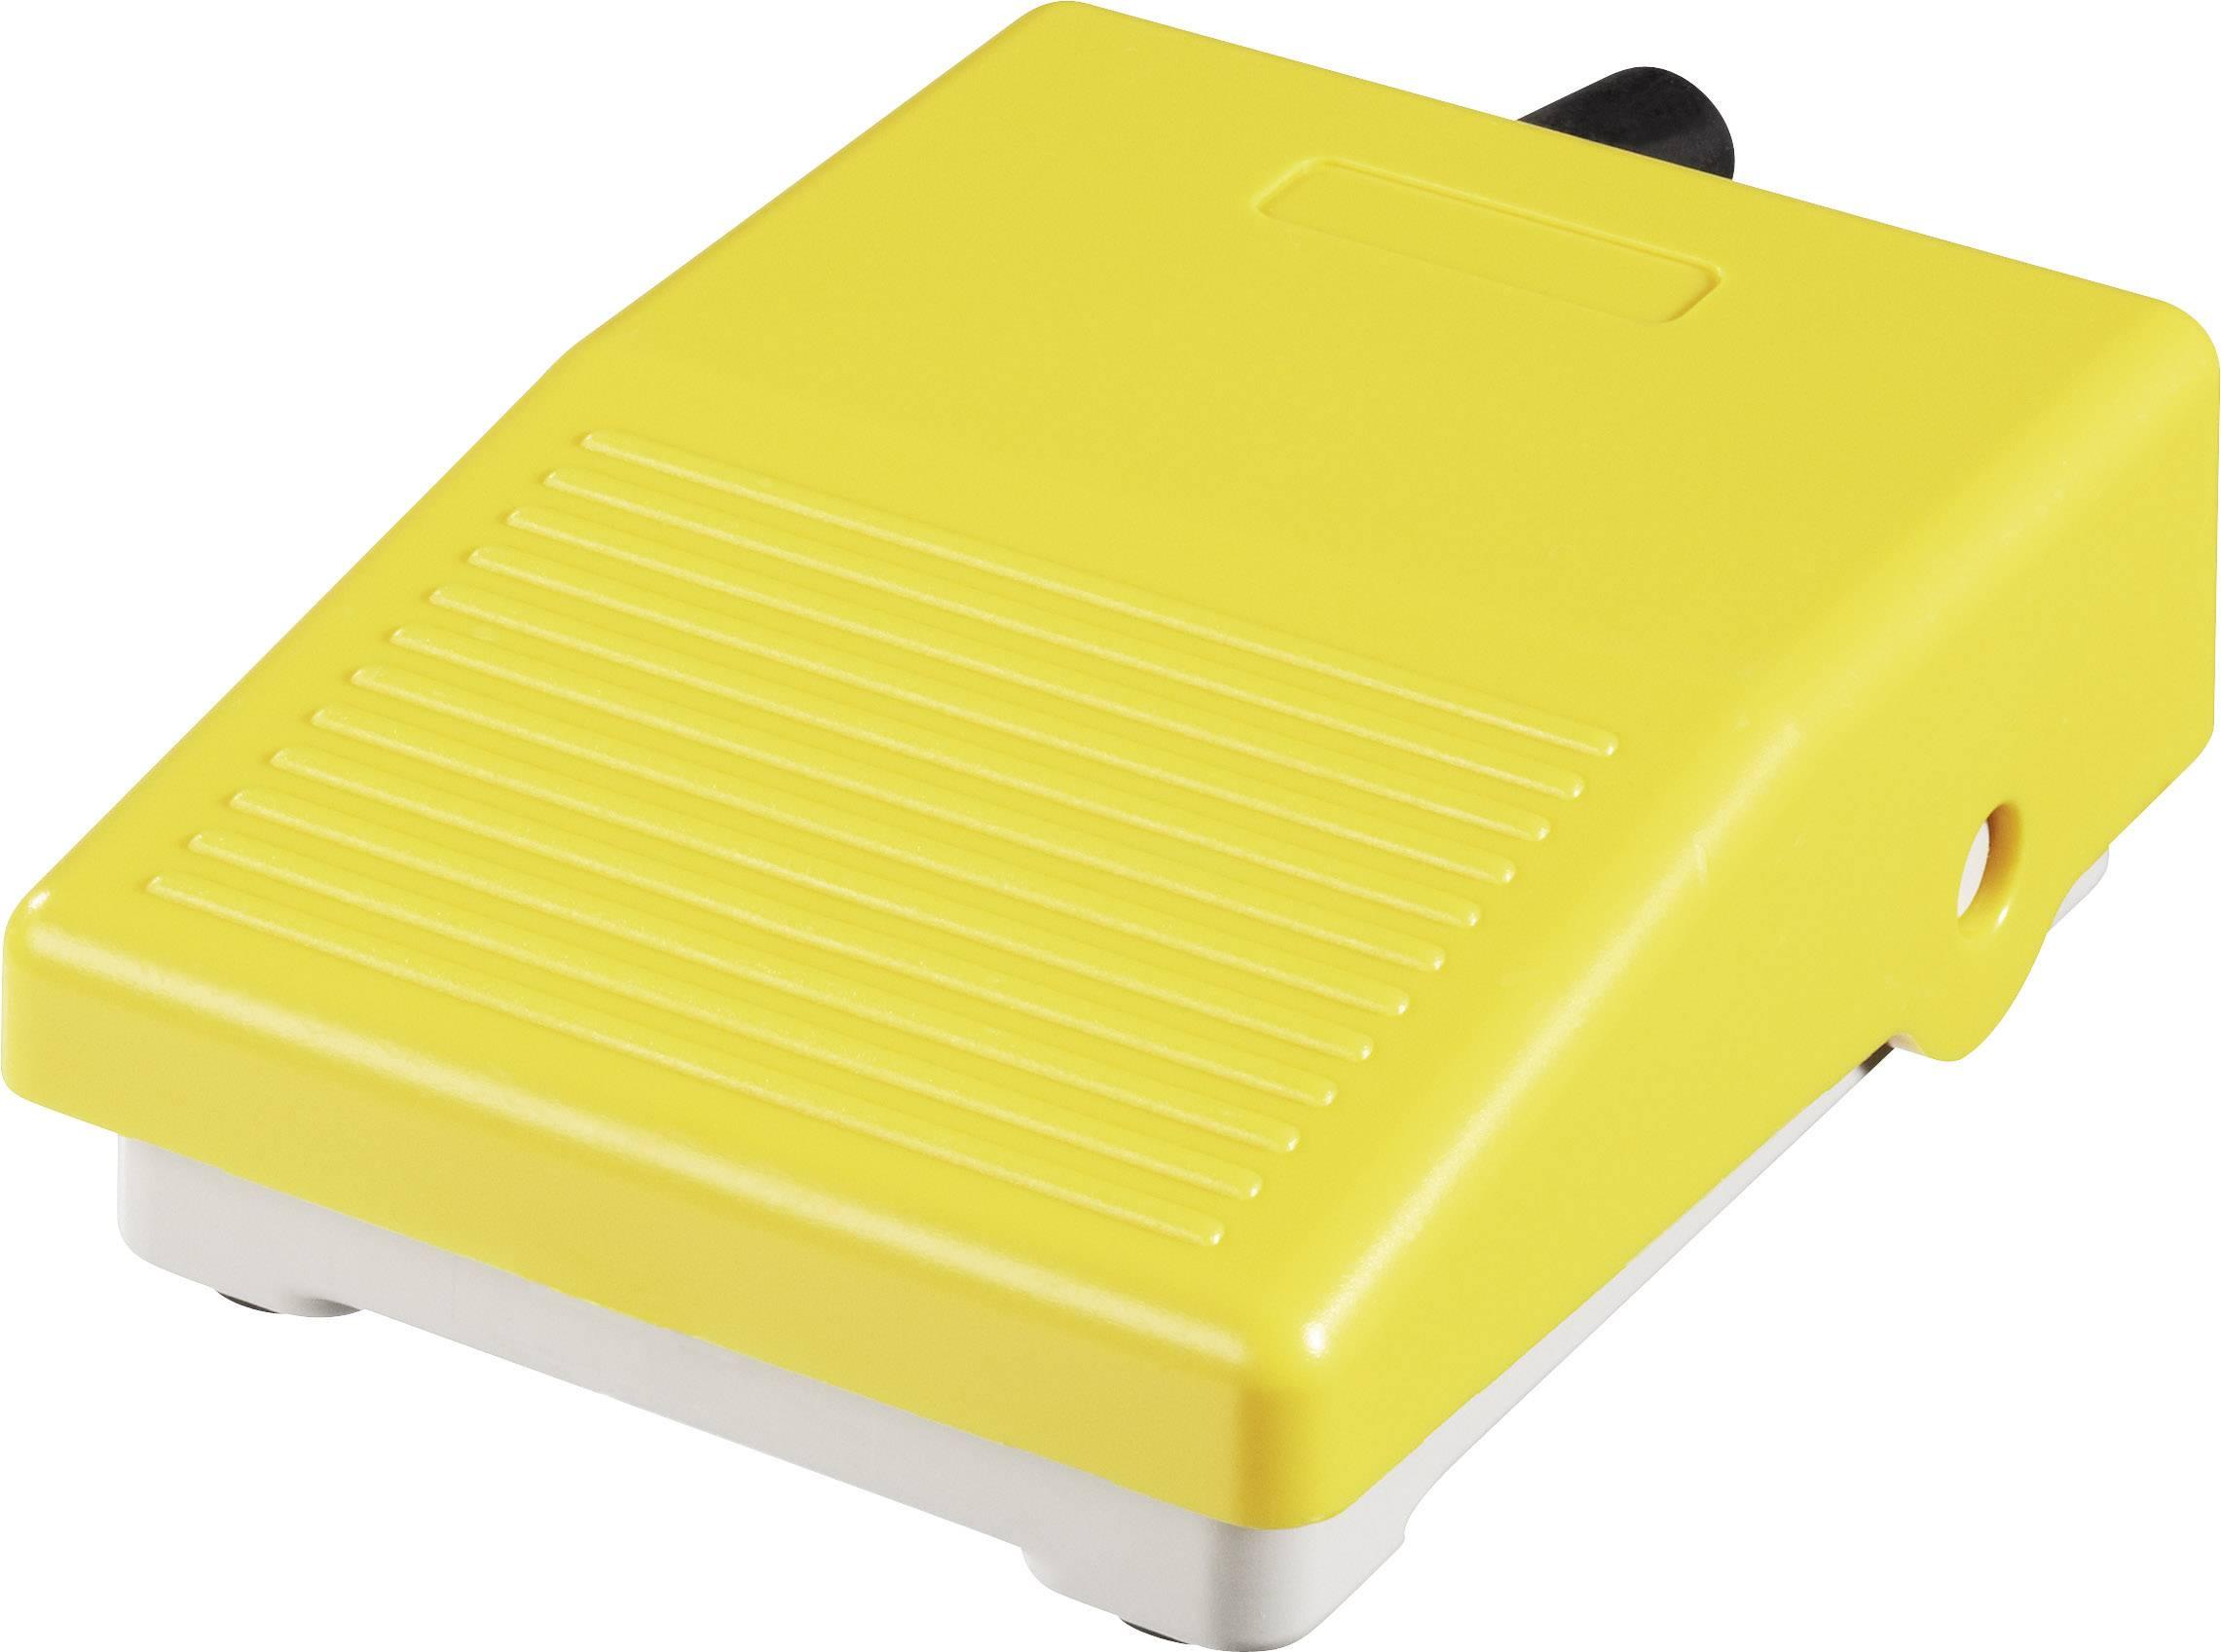 Nožní spínač ABB IPM2Y (1SBV001105R1823), 3 A, IP40, plast, PG16, žlutá